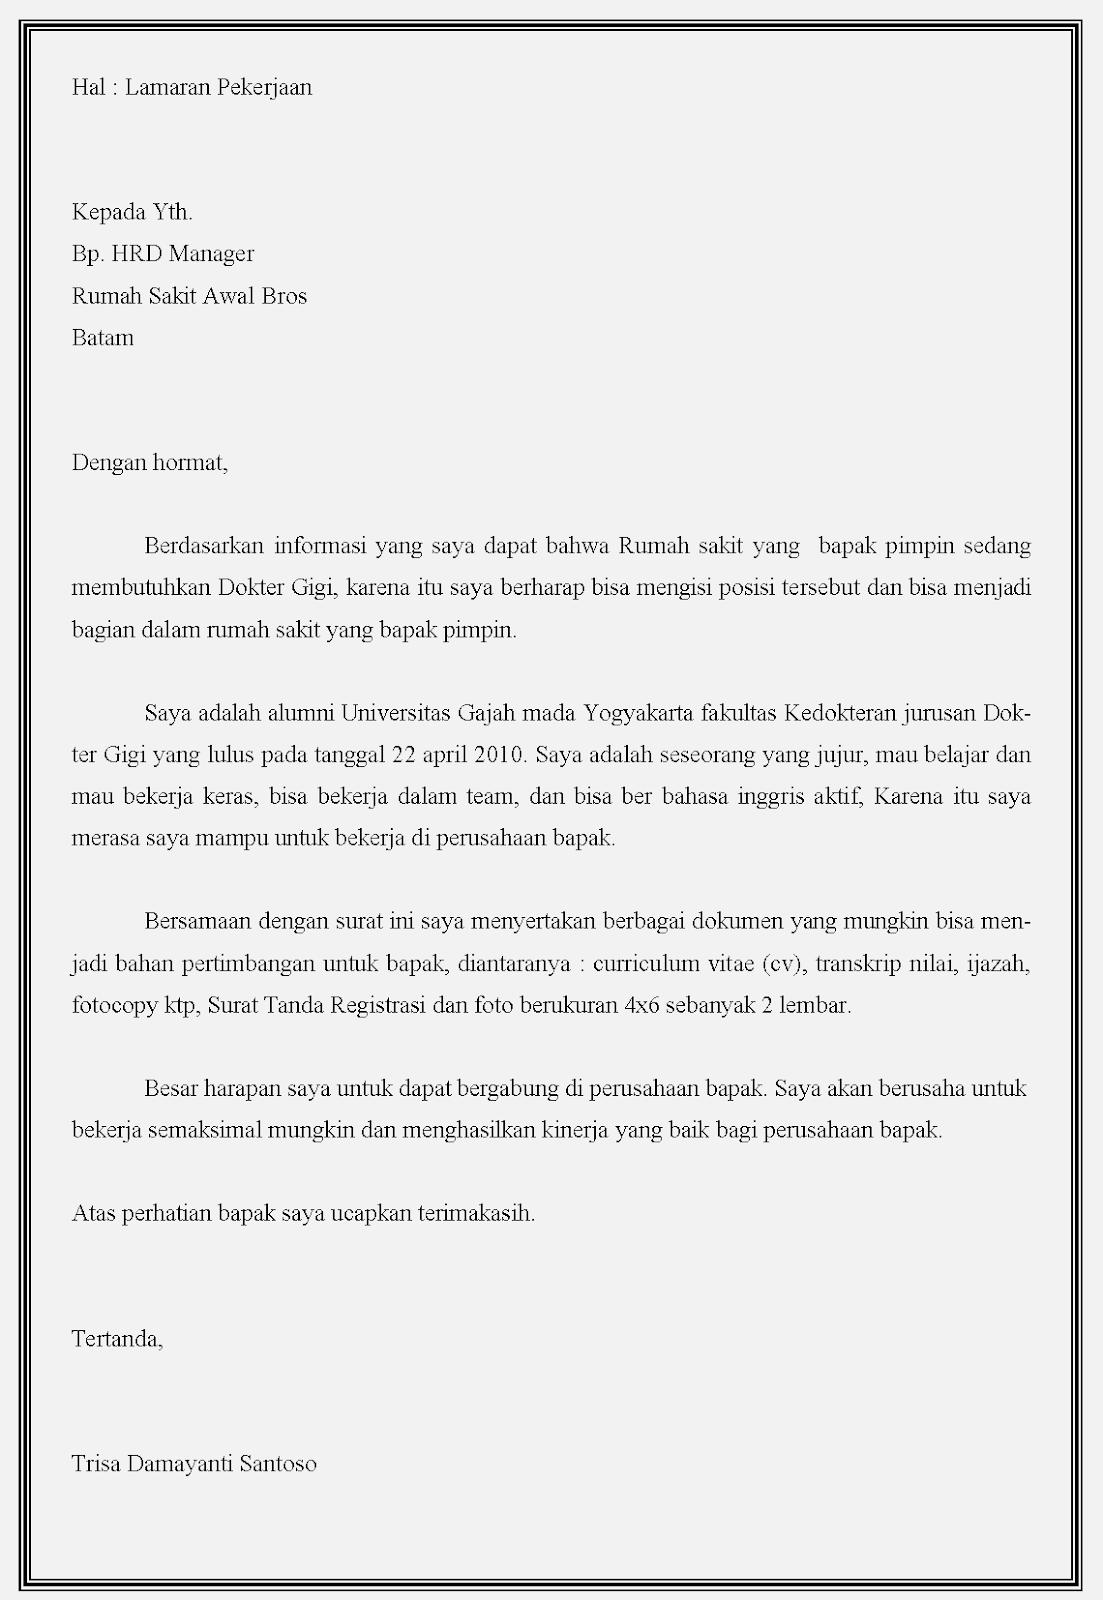 Contoh surat lamaran kerja dokter di awal Bros batam